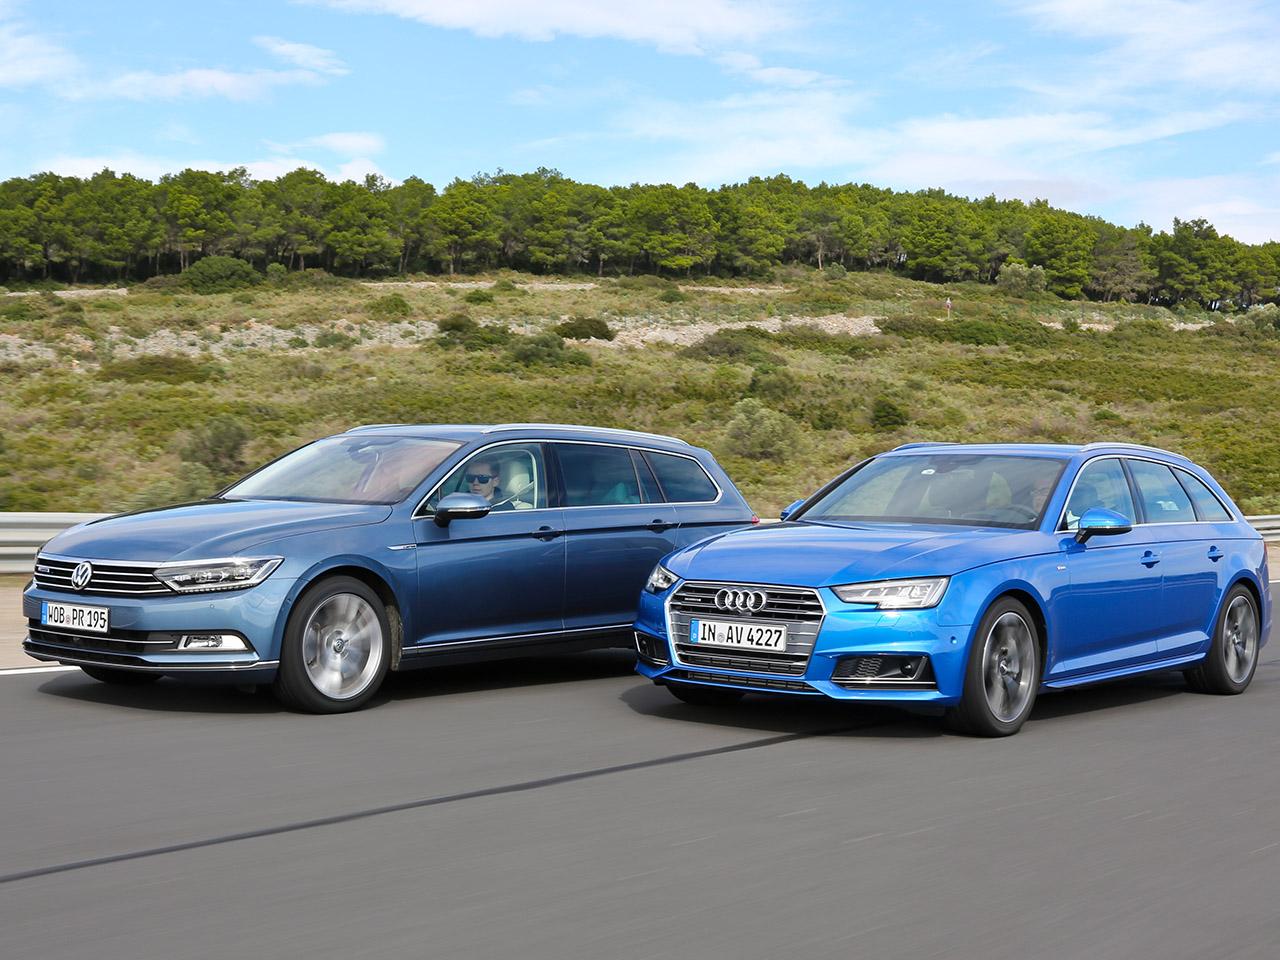 Audi A4 Avantvw Passat Variant Vergleichstest Autozeitungde